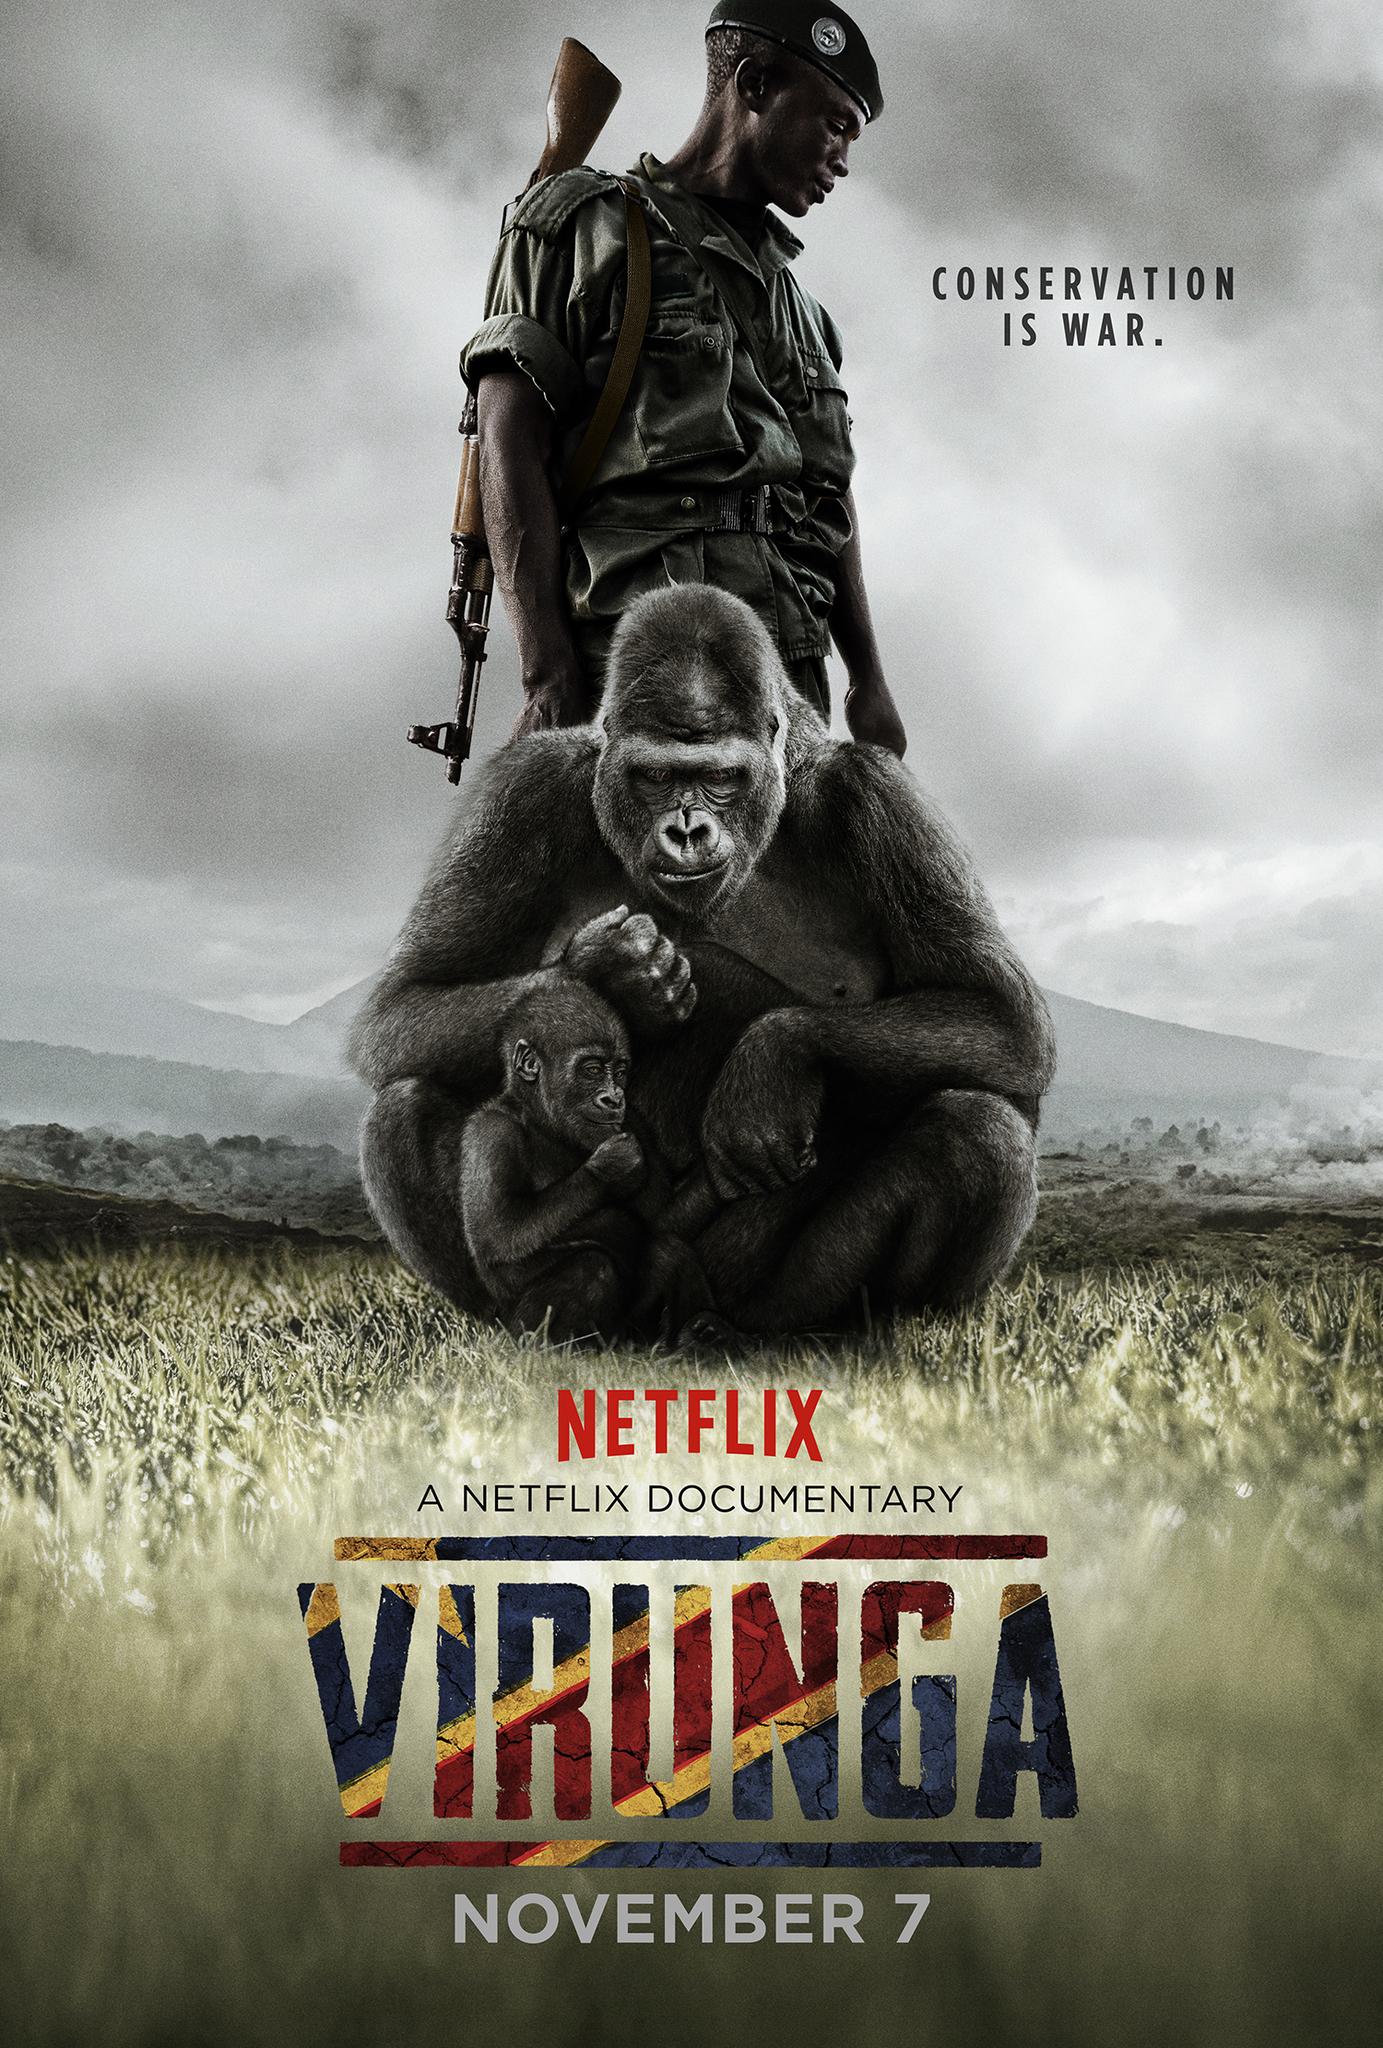 virunga documentary torrent download